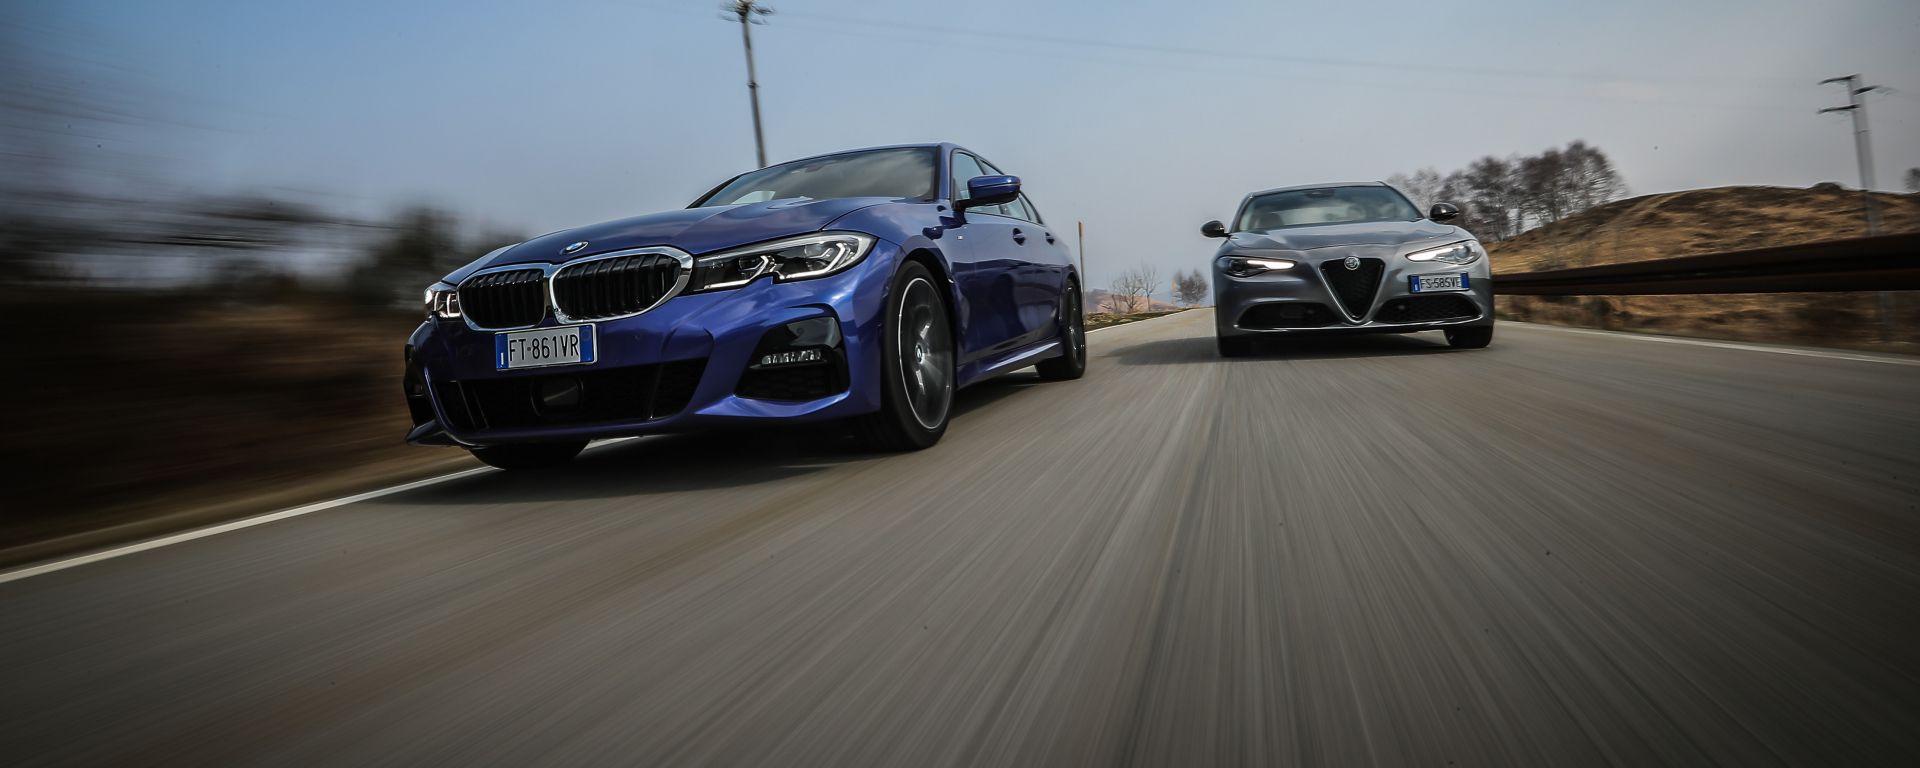 BMW 320d Msport e Alfa Romeo Giulia B-Tech 2.2 diesel a confronto